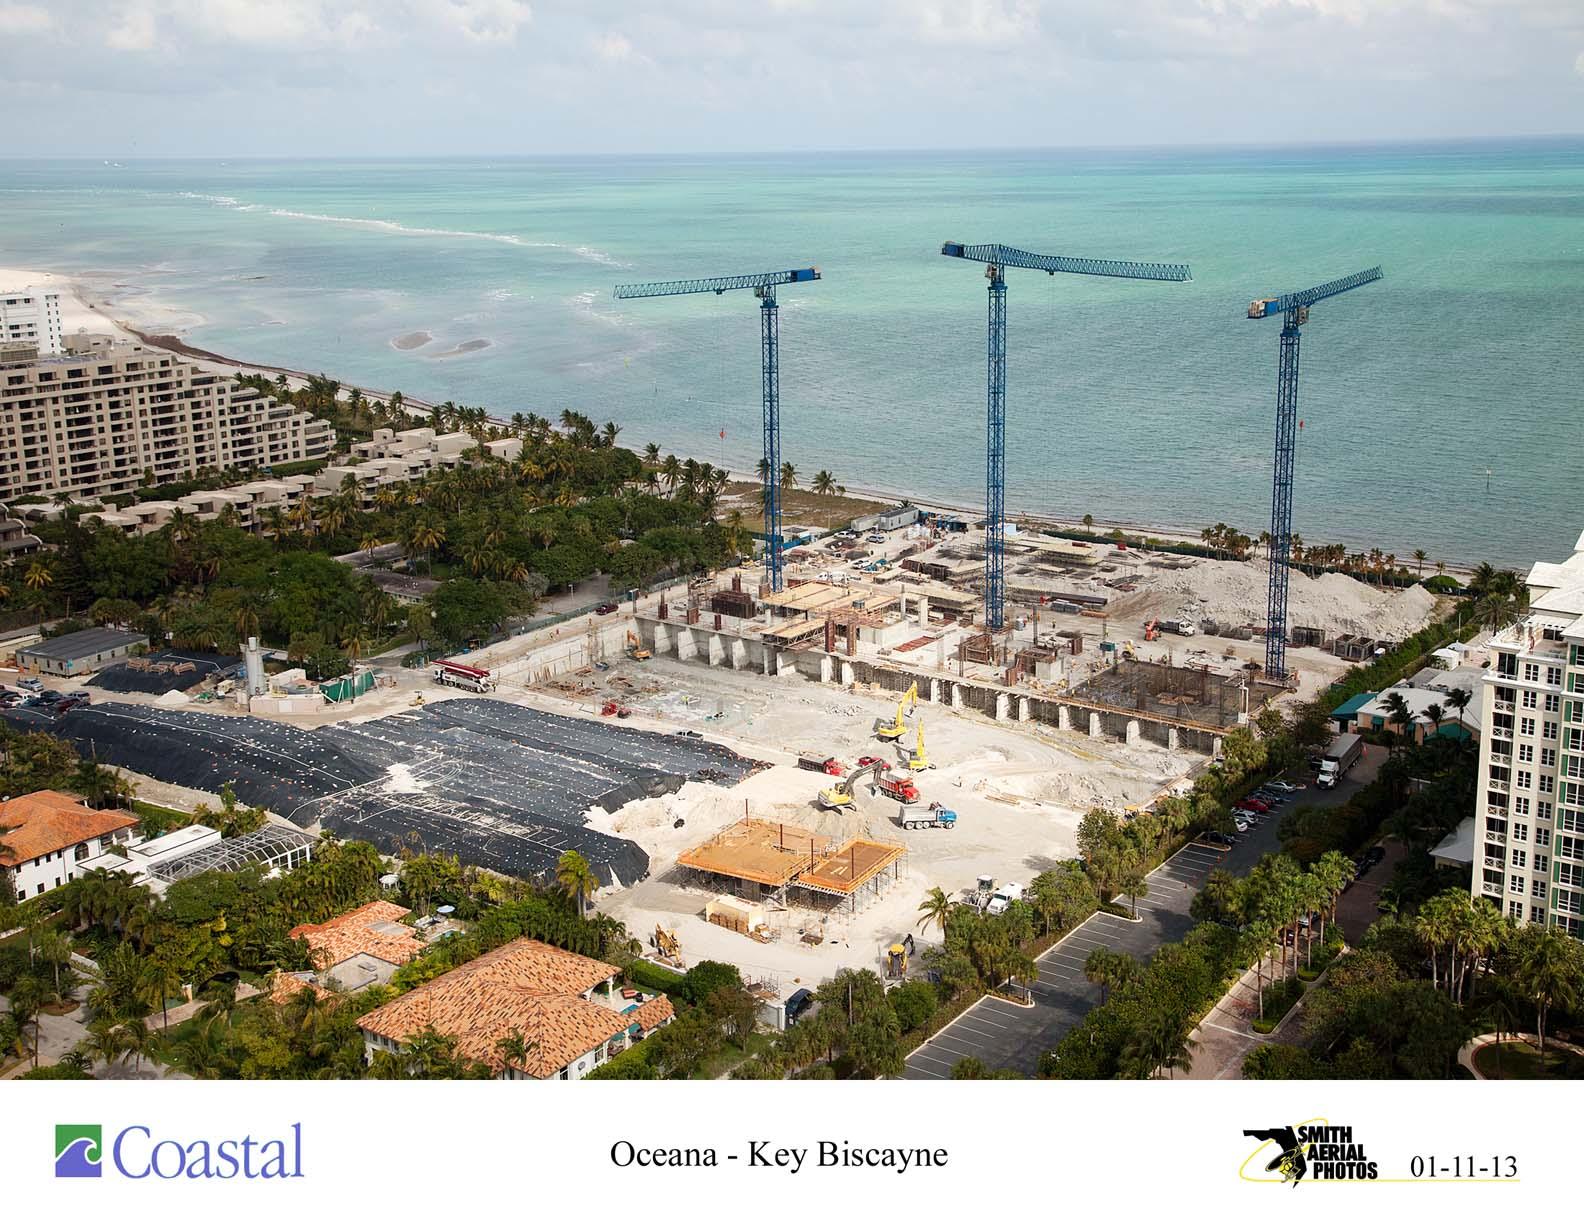 Construction 1 11 13 Oceana Key Biscayne